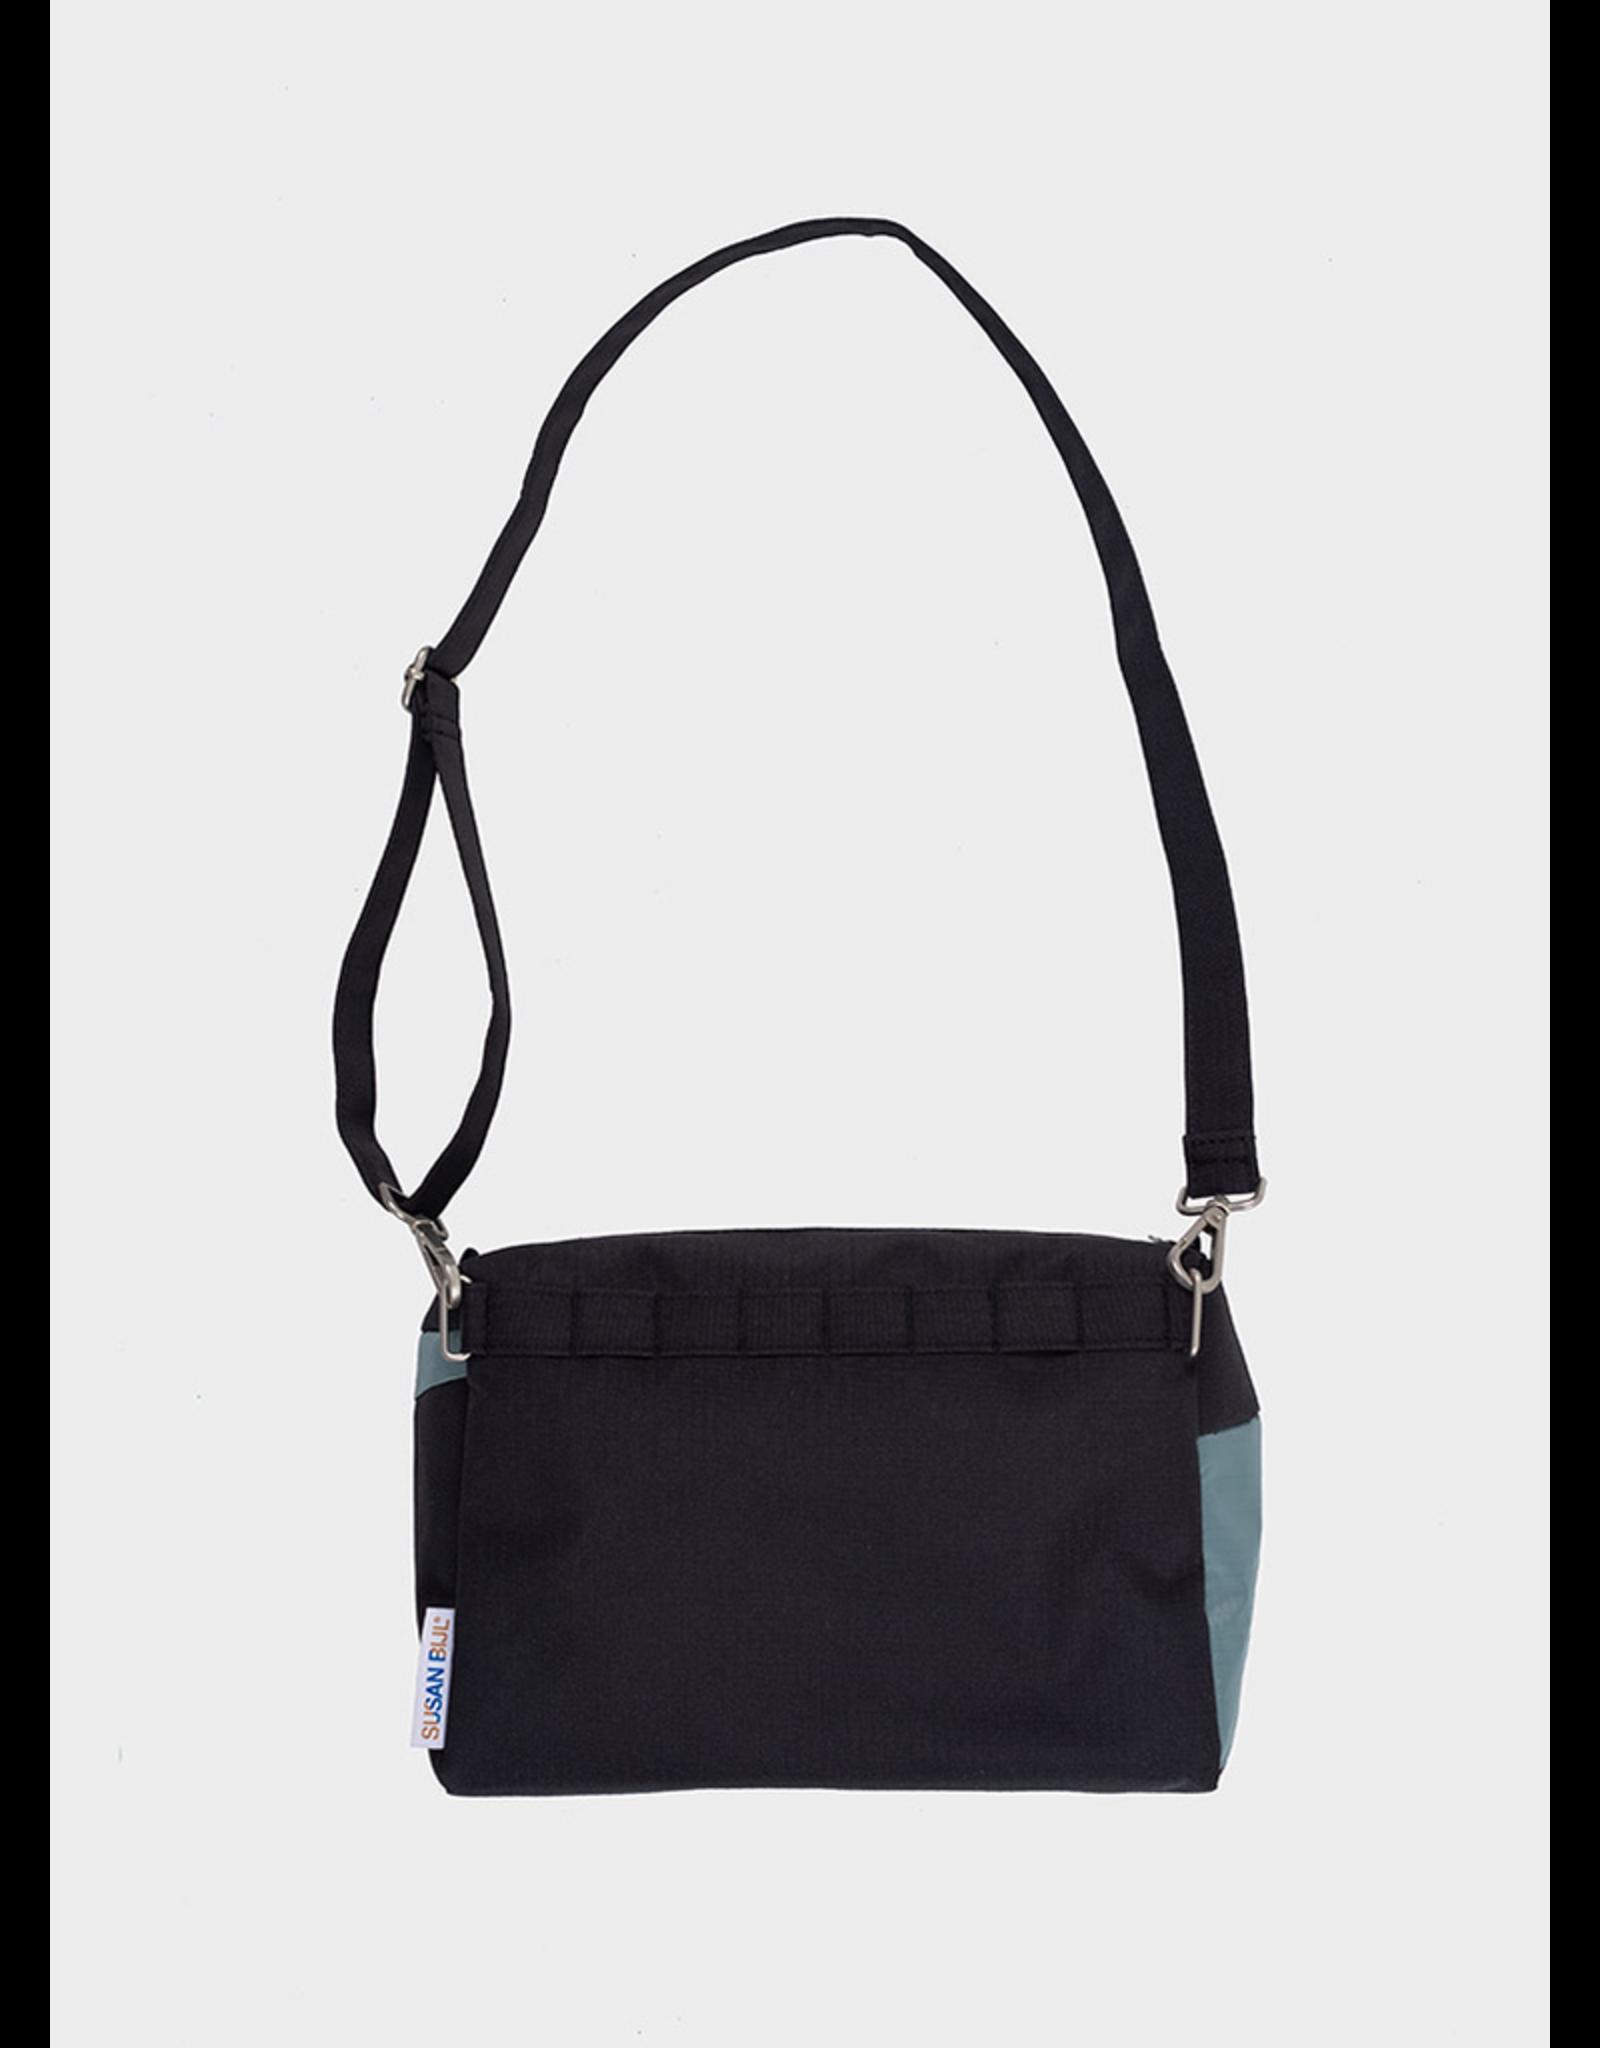 Suzan Bijl Bum Bag M, Black & Grey   19 x 28 x 8,5